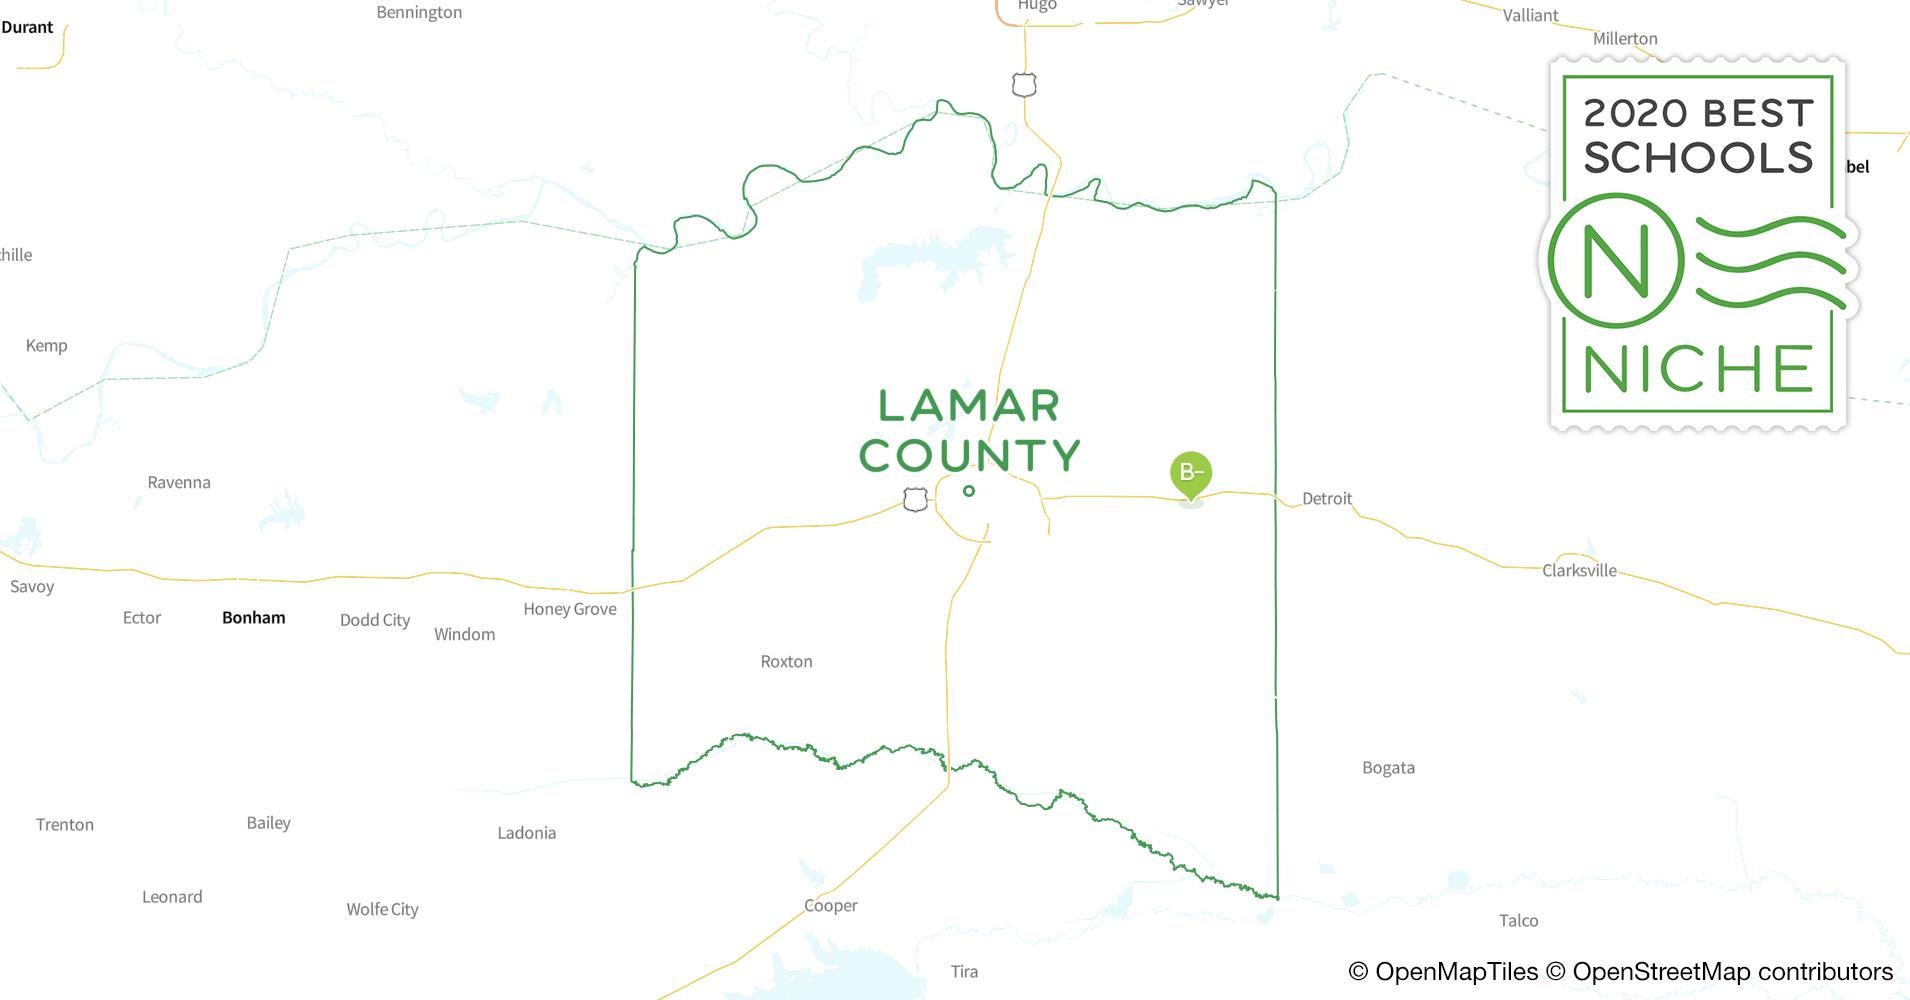 School Districts in Lamar County, TX - Niche